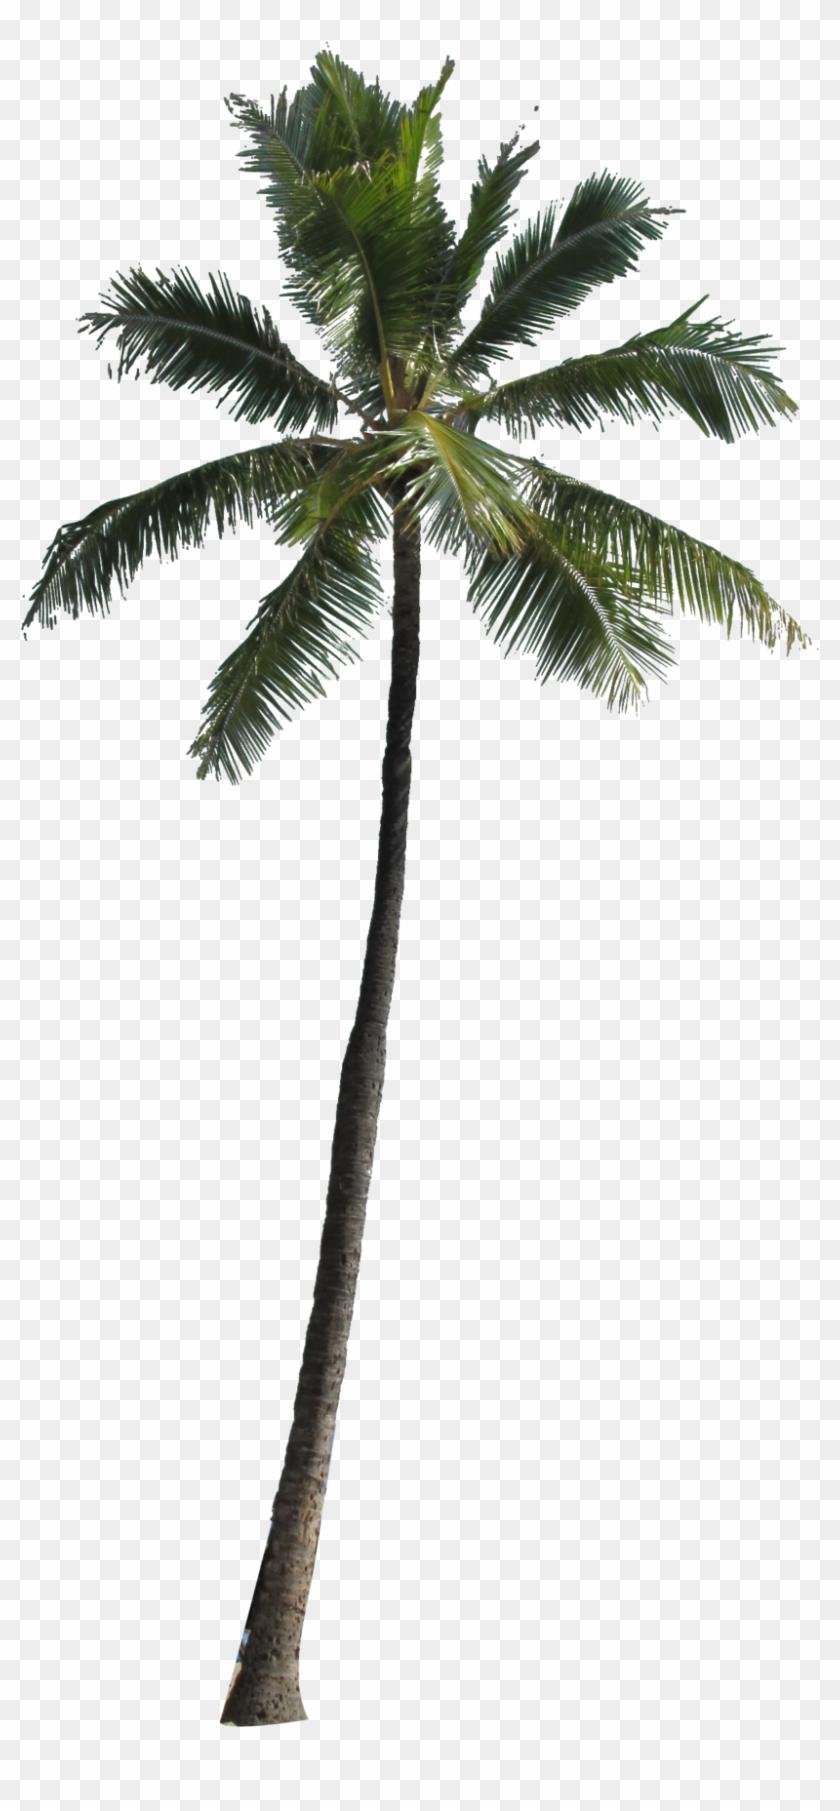 Arecaceae Tree Clip Art - Coconut Tree For Photoshop #387542